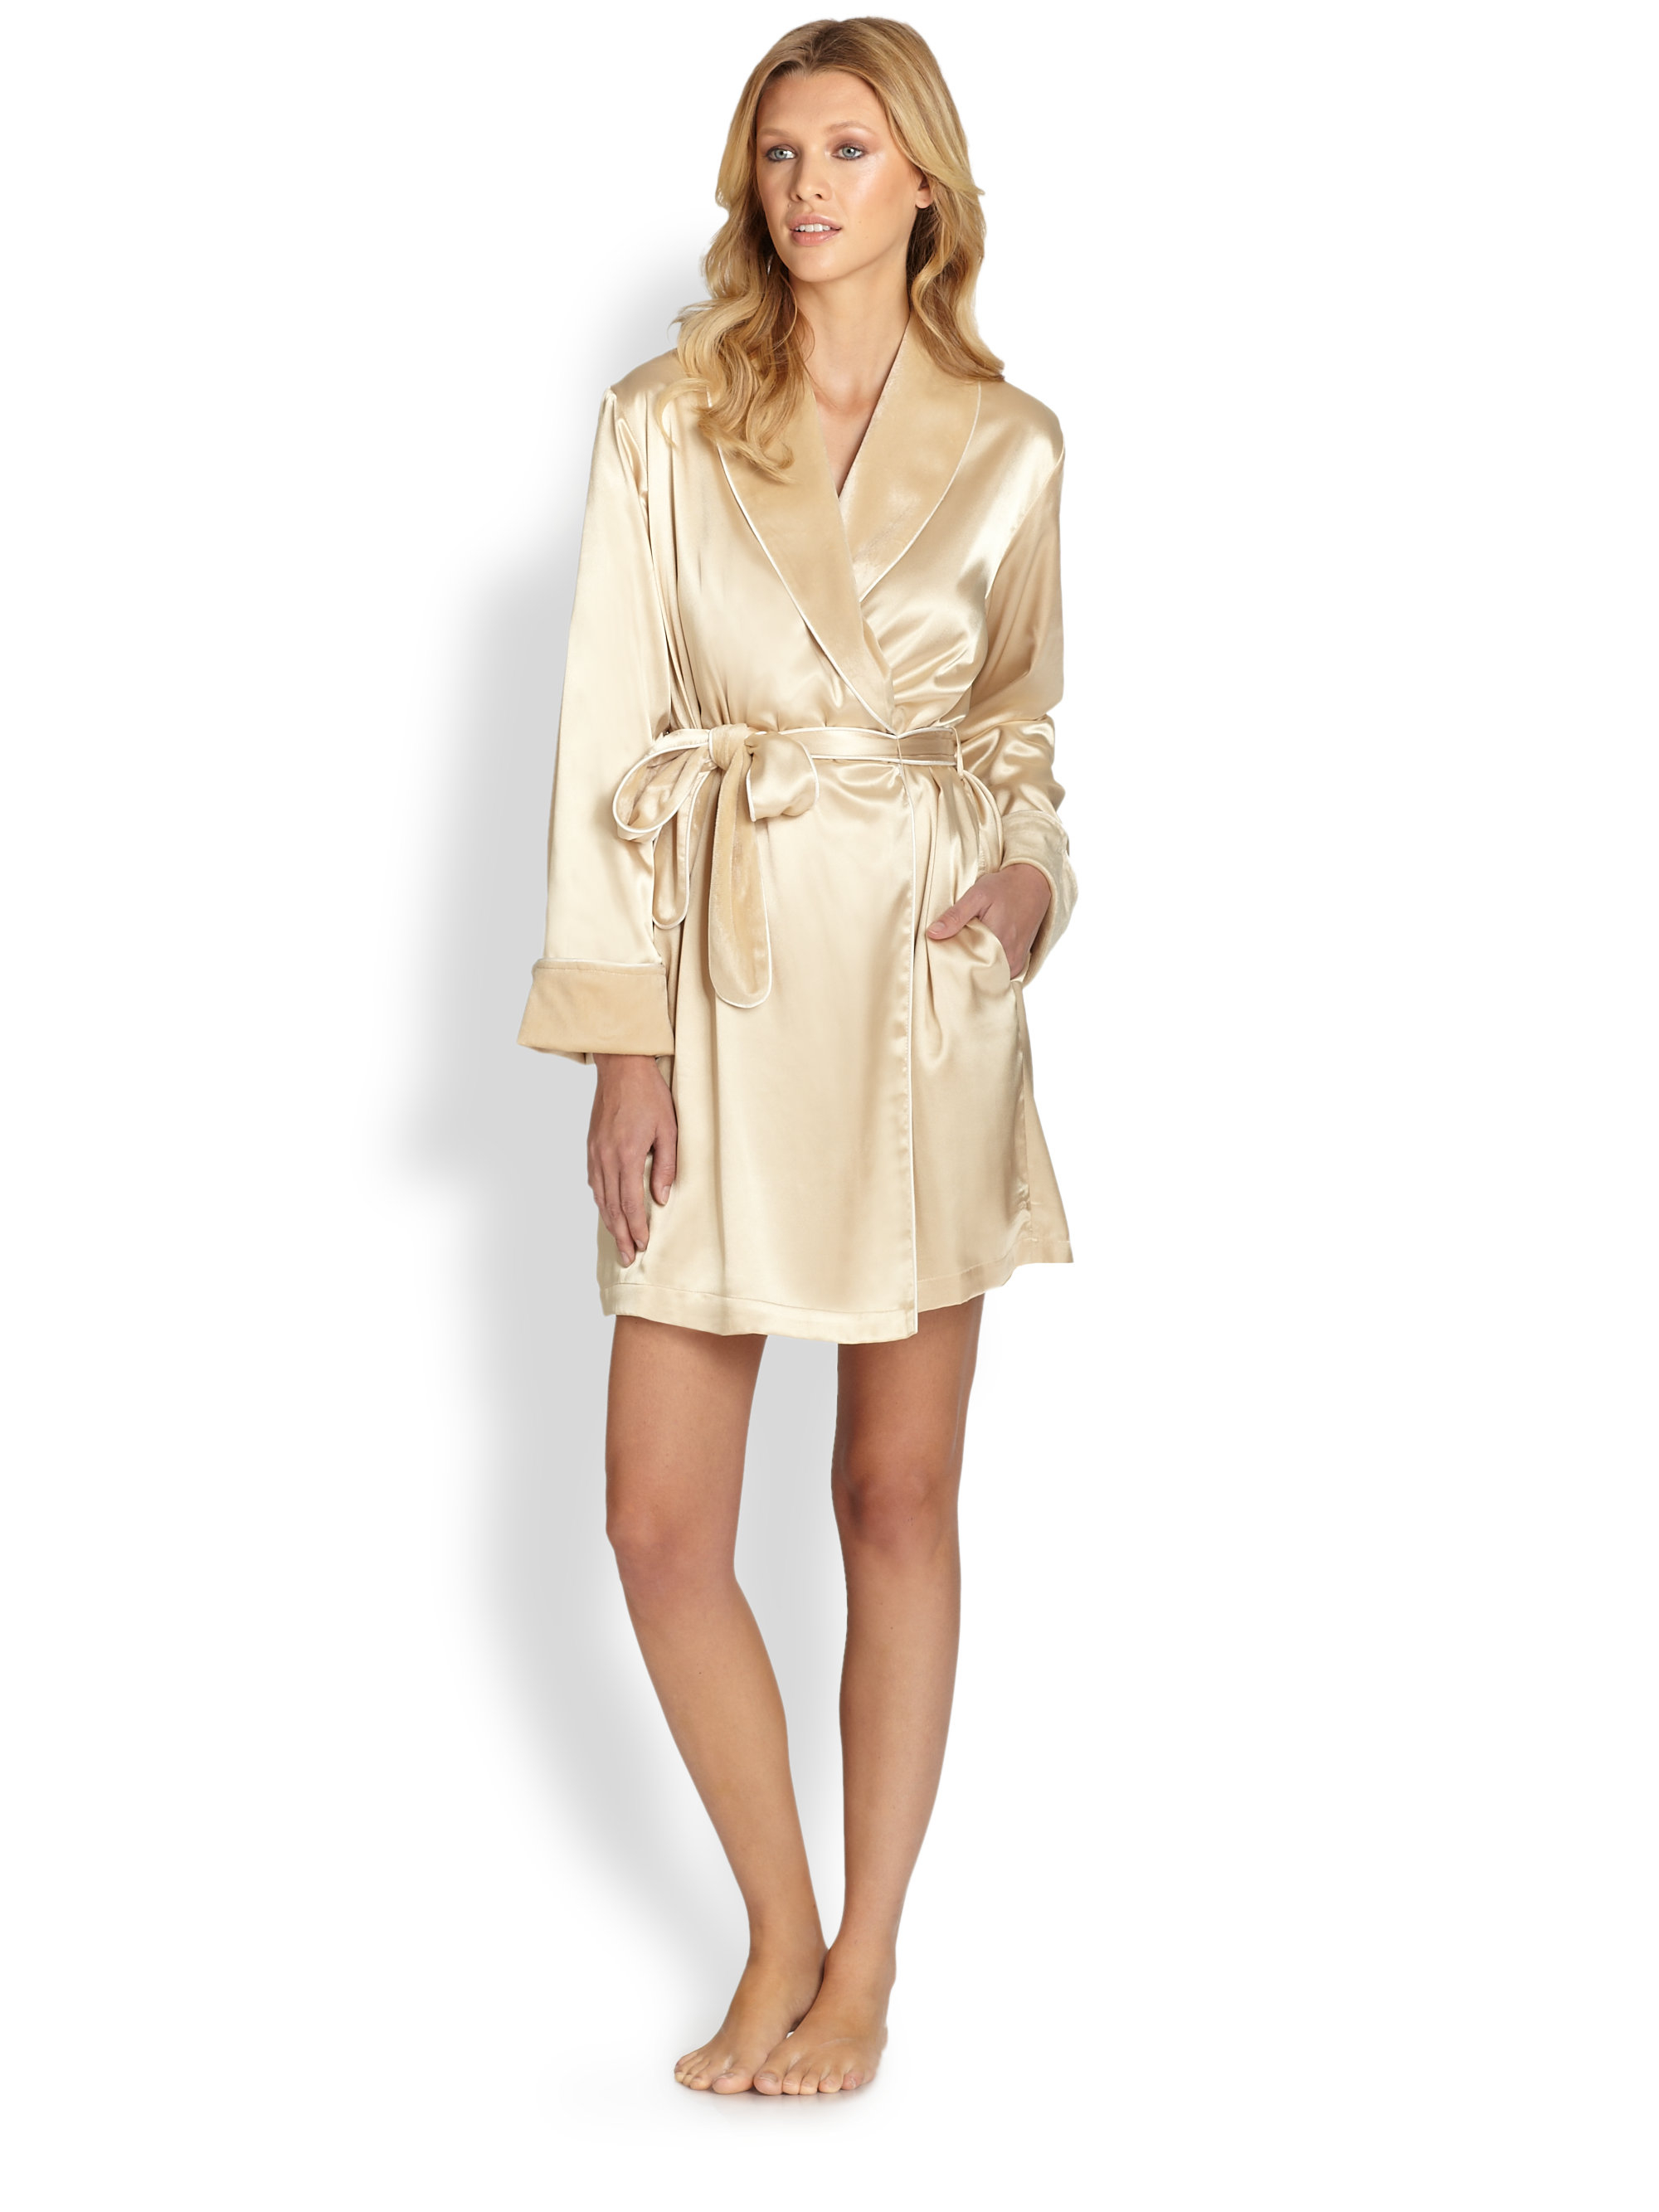 Wedding Satin Robes oscar de la renta faux fur lined satin robe in metallic lyst gallery